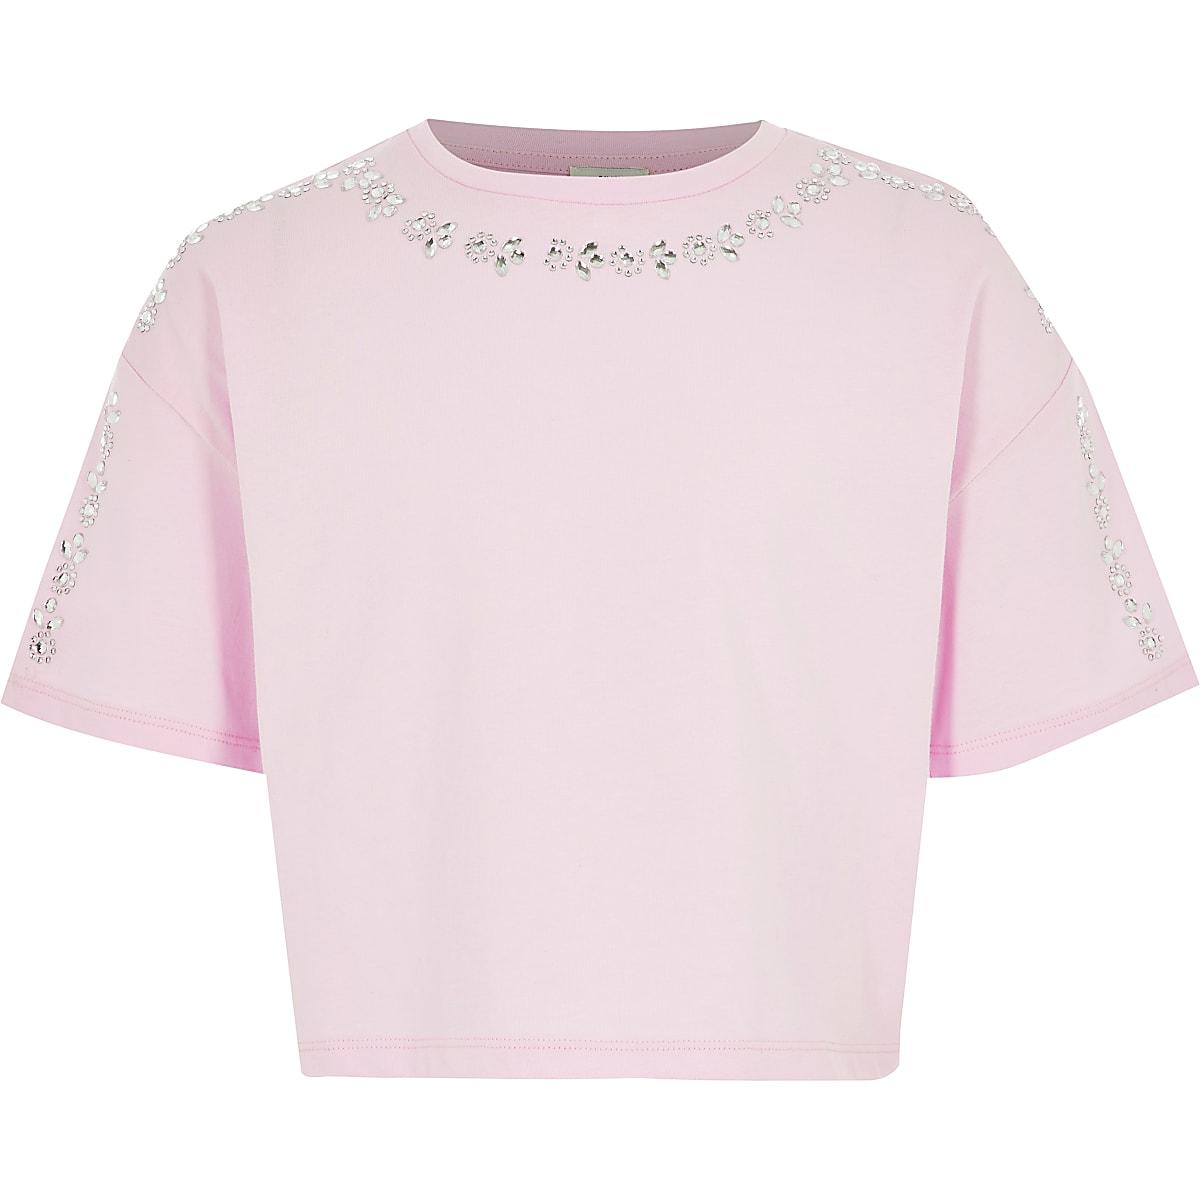 Girls pink embellished cropped T-shirt